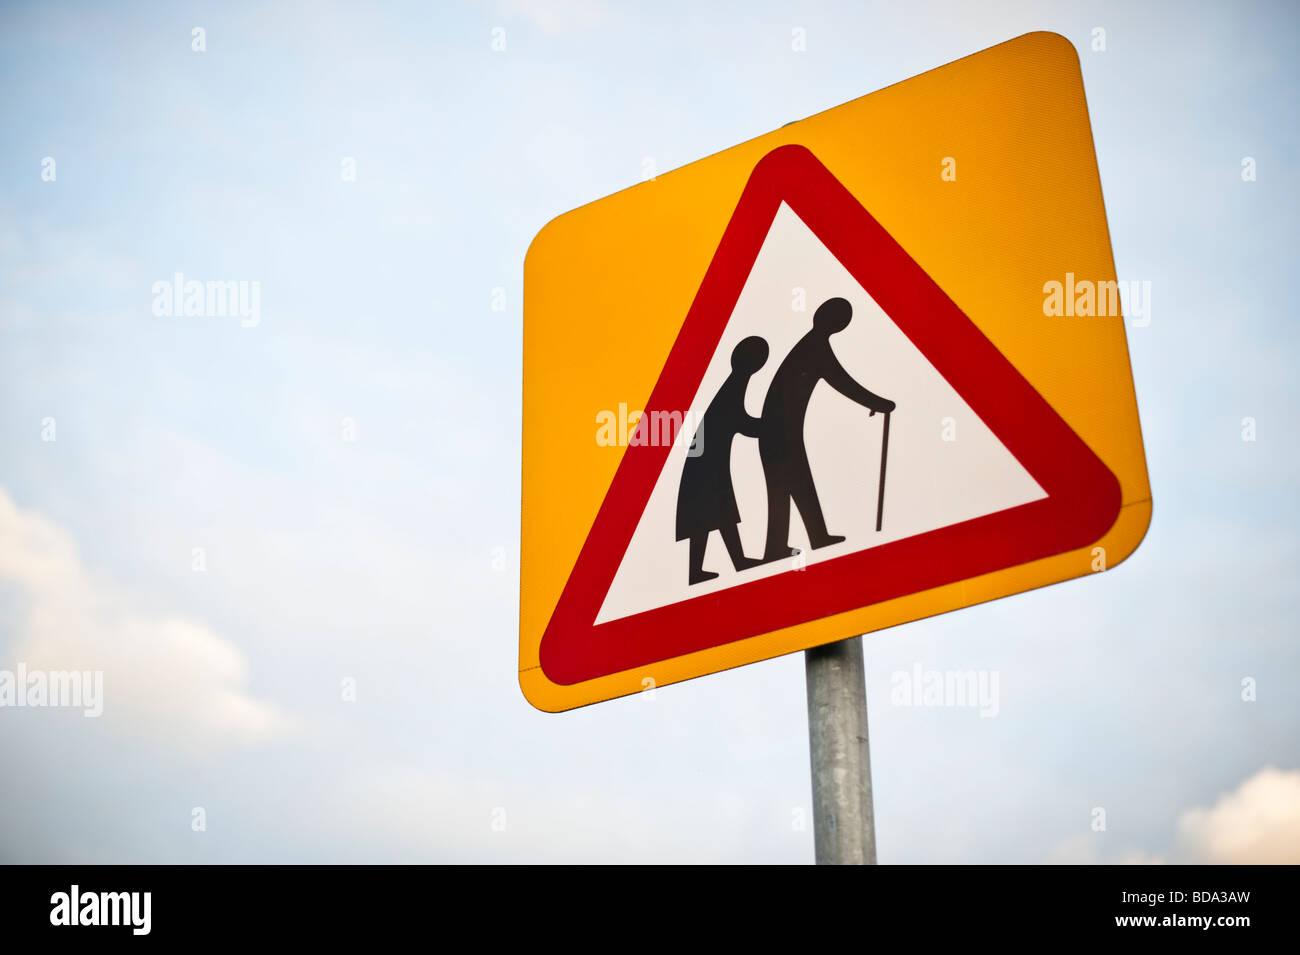 Elderly People road sign warning triangle UK - Stock Image